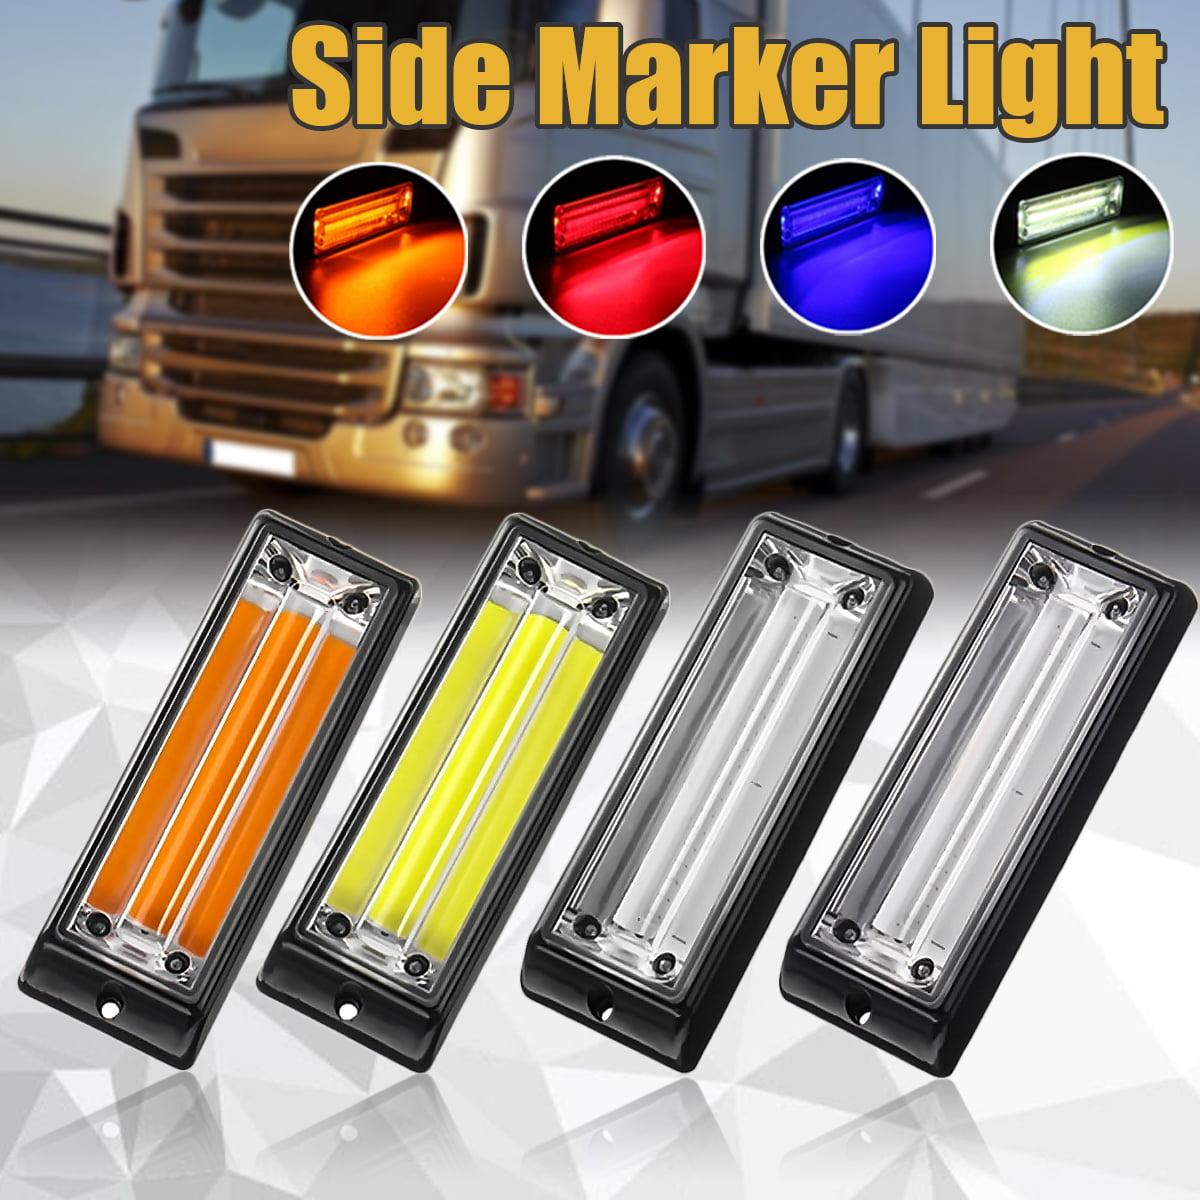 12-24V Car Marker Side Lights Indicator Reversing Lamp Trucks Van Trailers Cars Boats Lamp Caution Strobe Lights